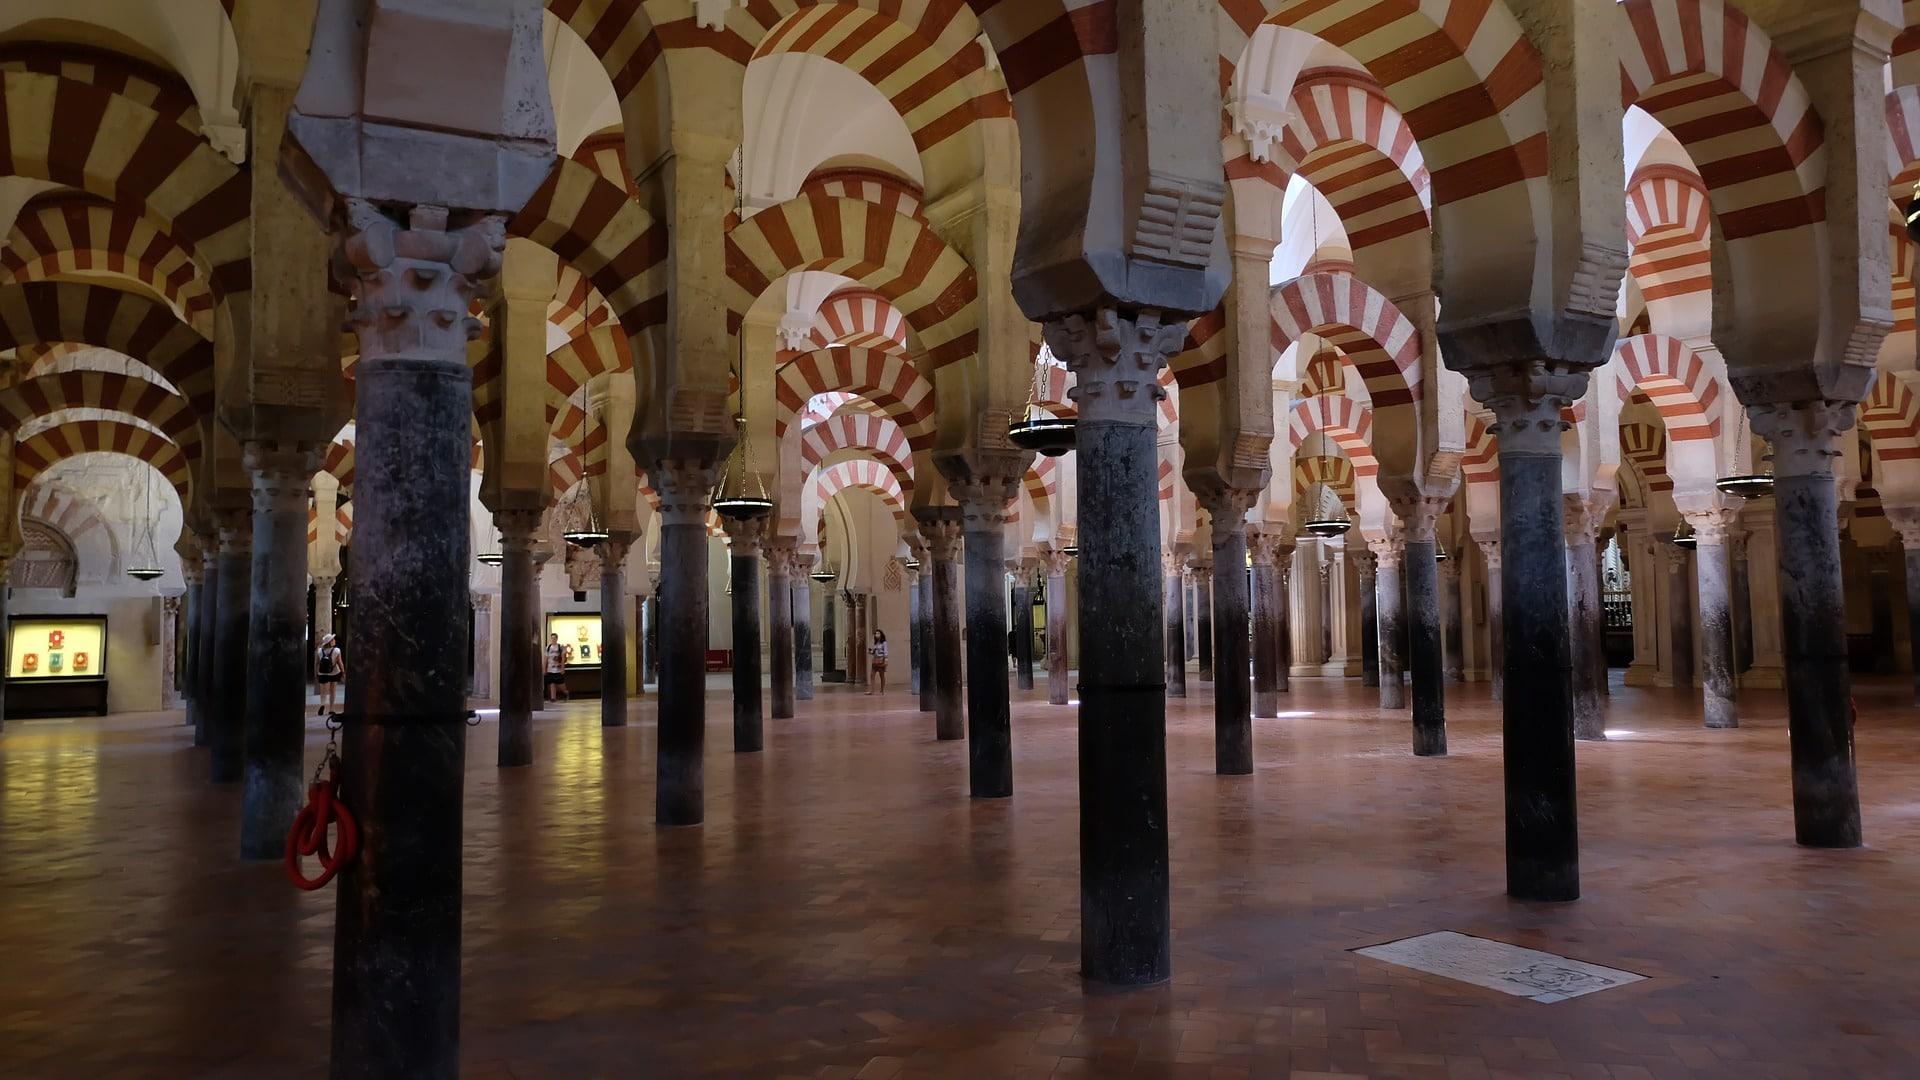 Mezquita-Catedral de Córdoba (Foto: Nicolás Puente)